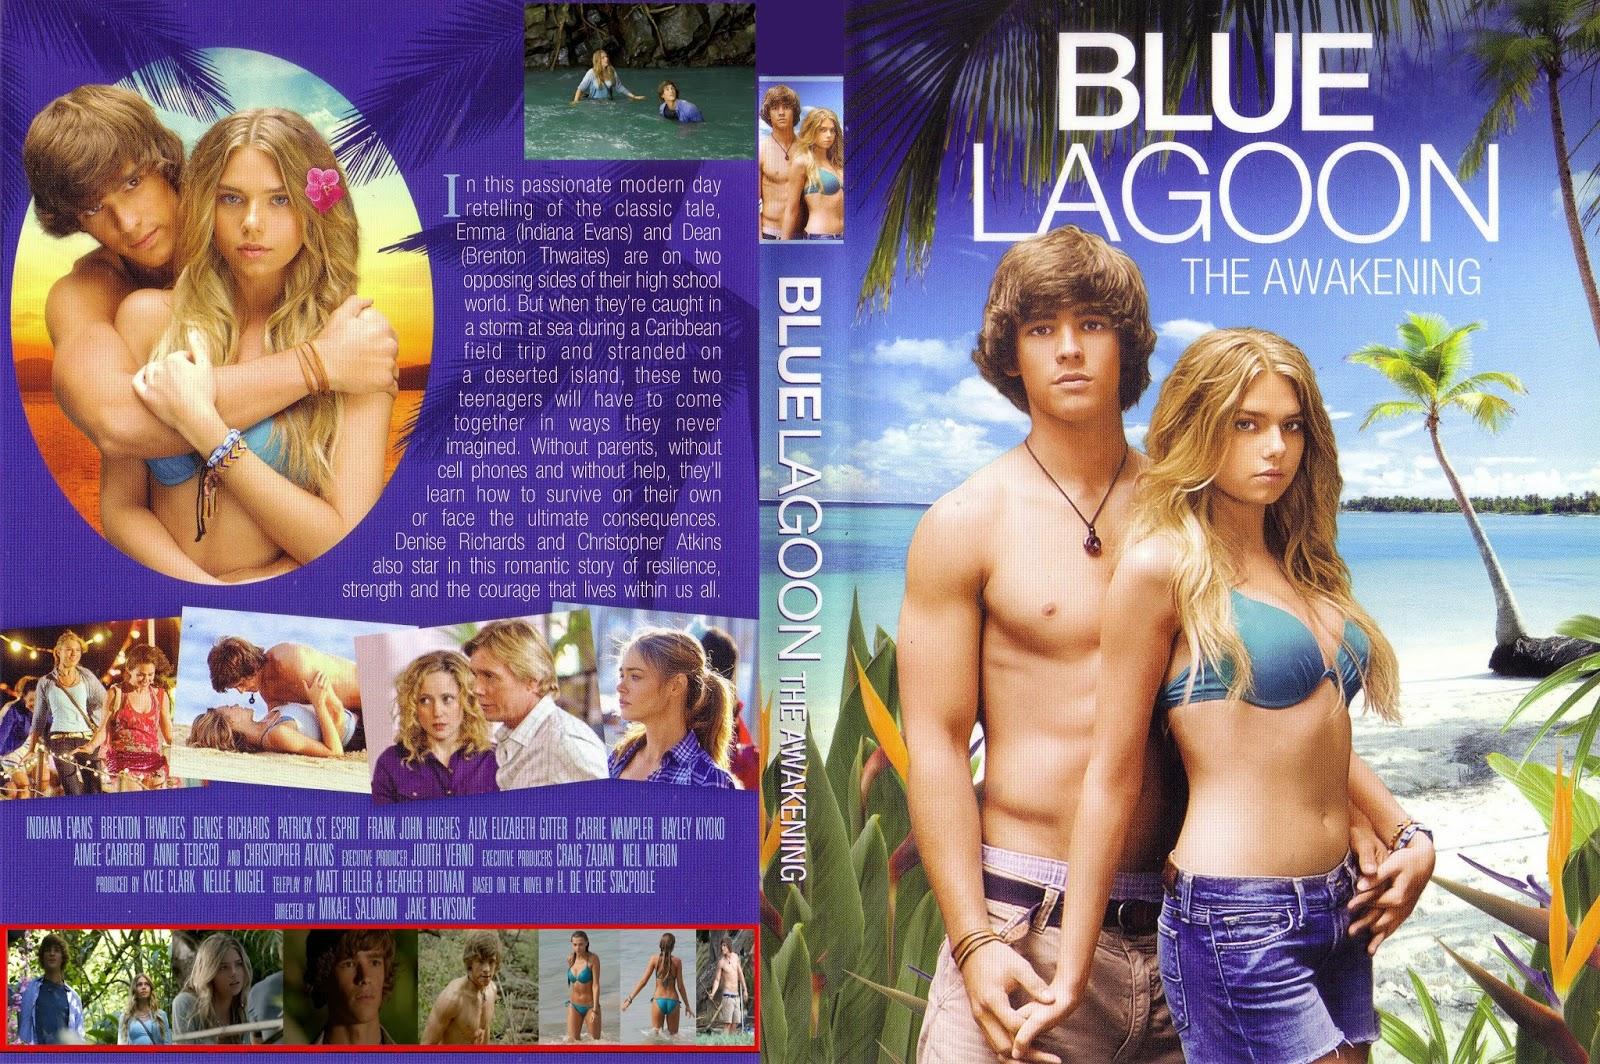 Blue Lagoon The Awakening Full Movie Online Dailymotion